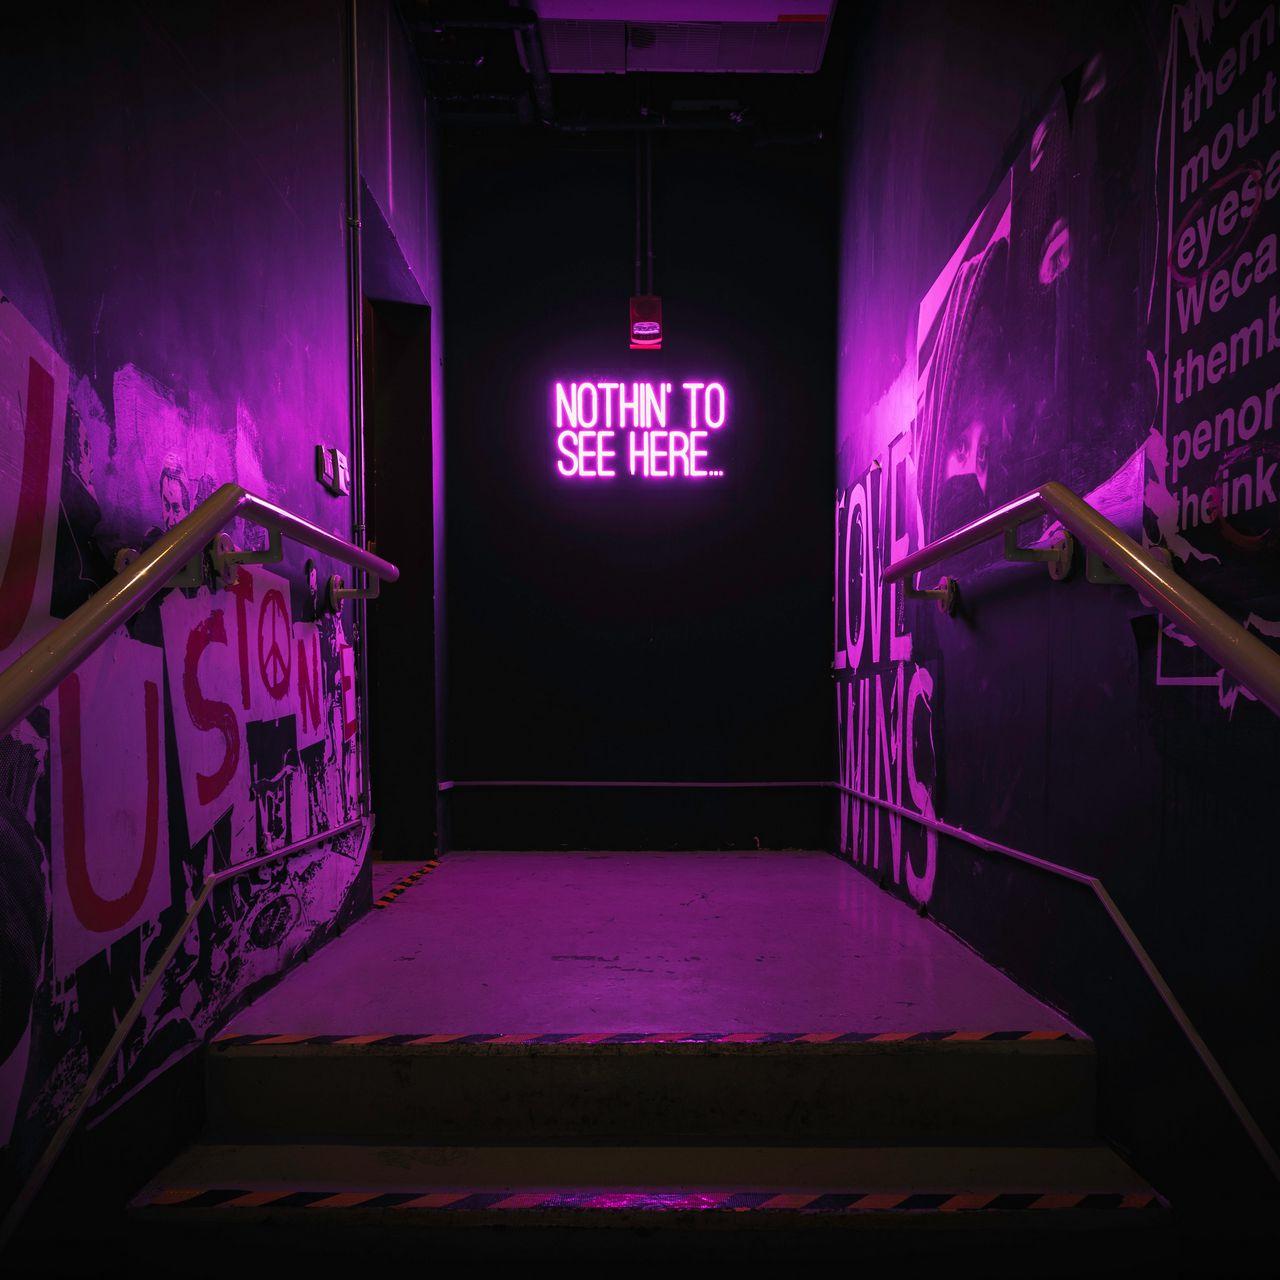 1280x1280 Wallpaper neon, inscription, wall, purple, backlight